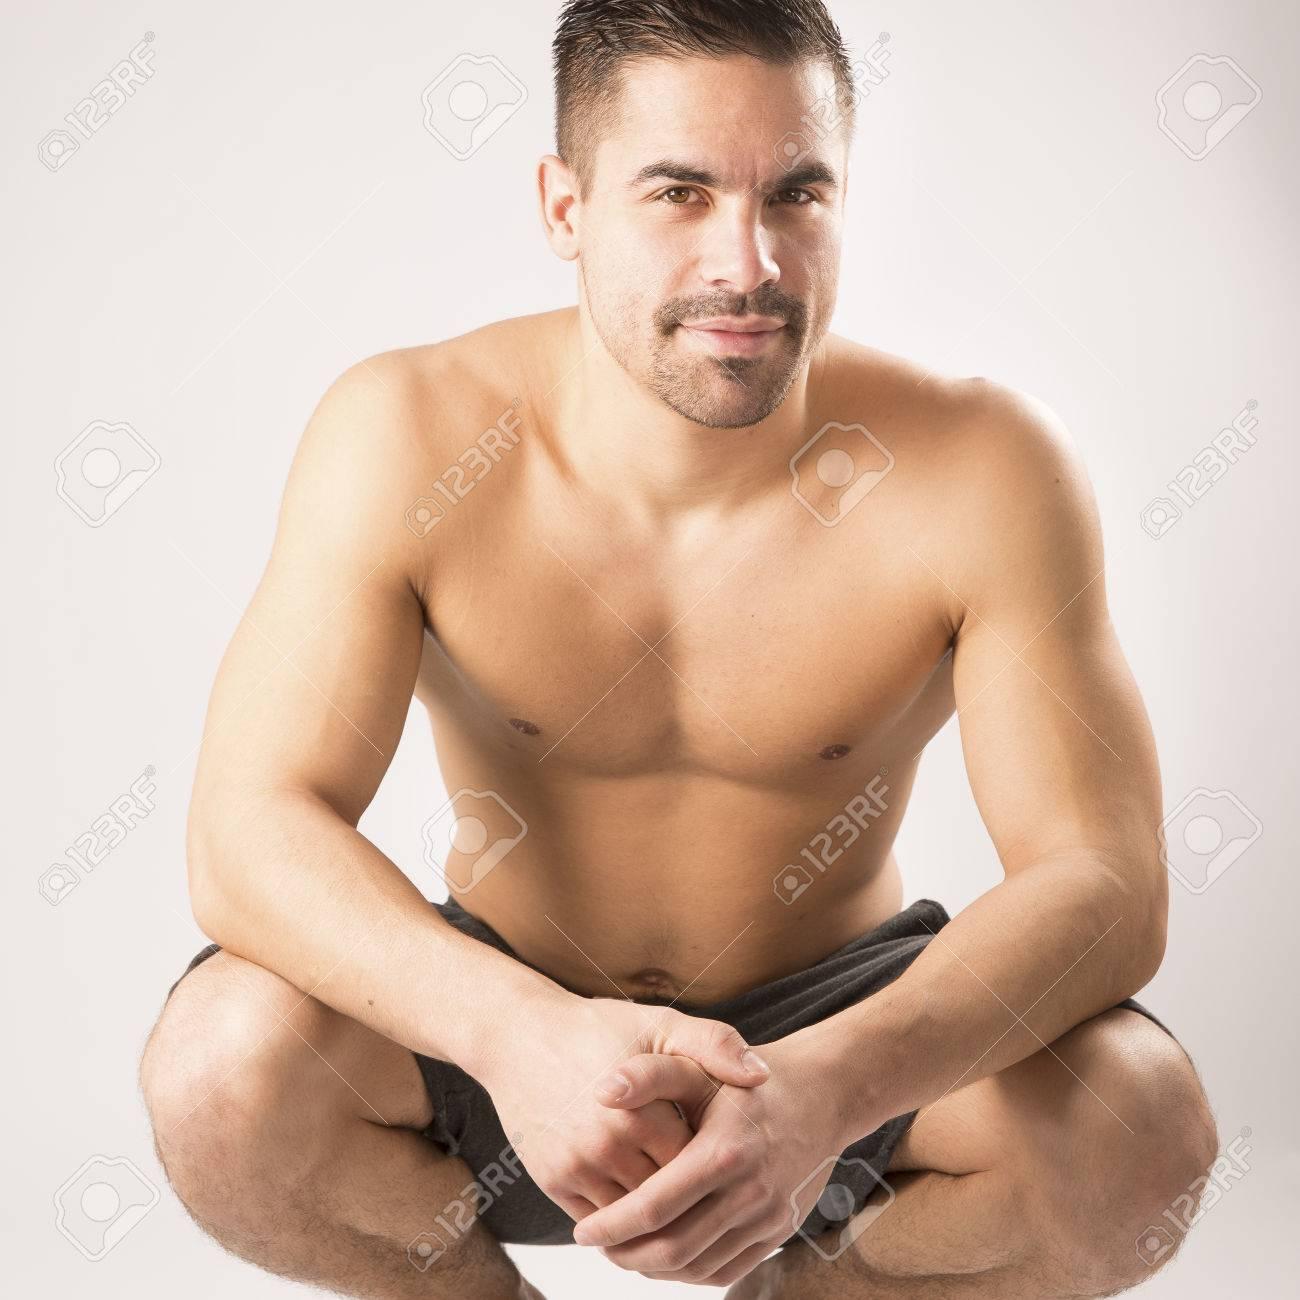 Красавец гей видео